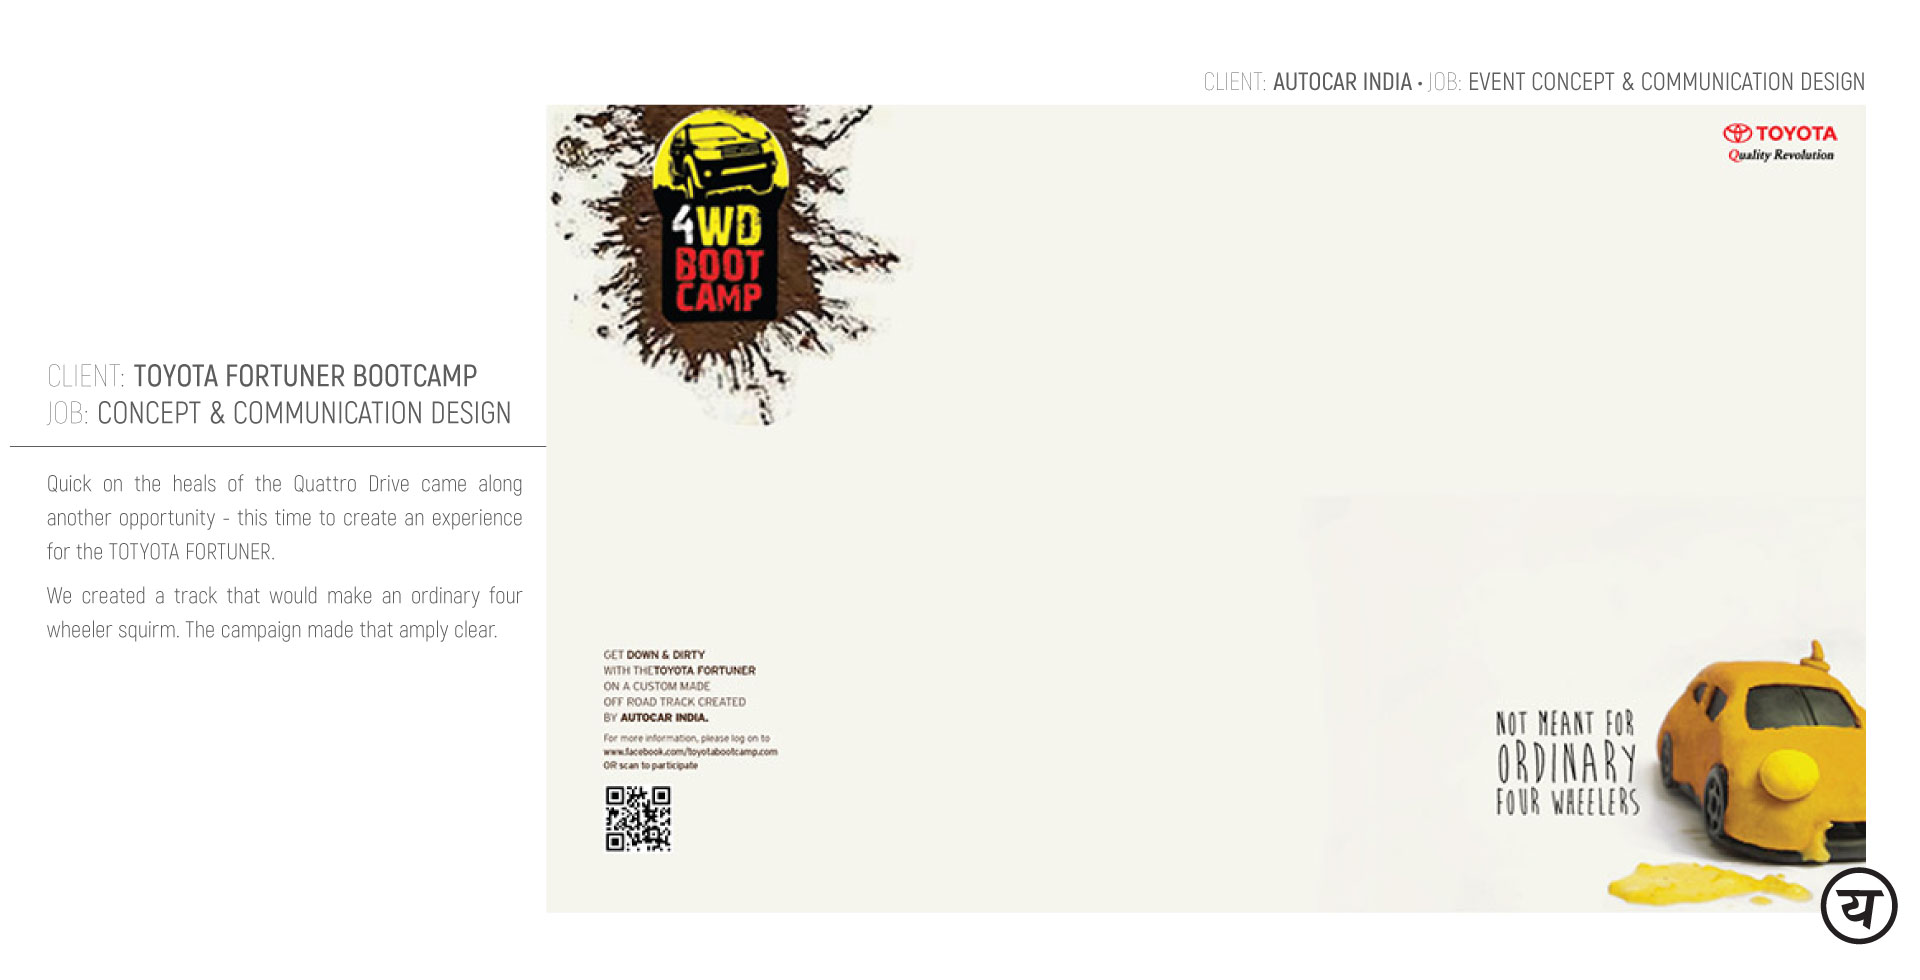 YesYesWhyNot_Communication-Design_Haymarket-#5_04.08.19